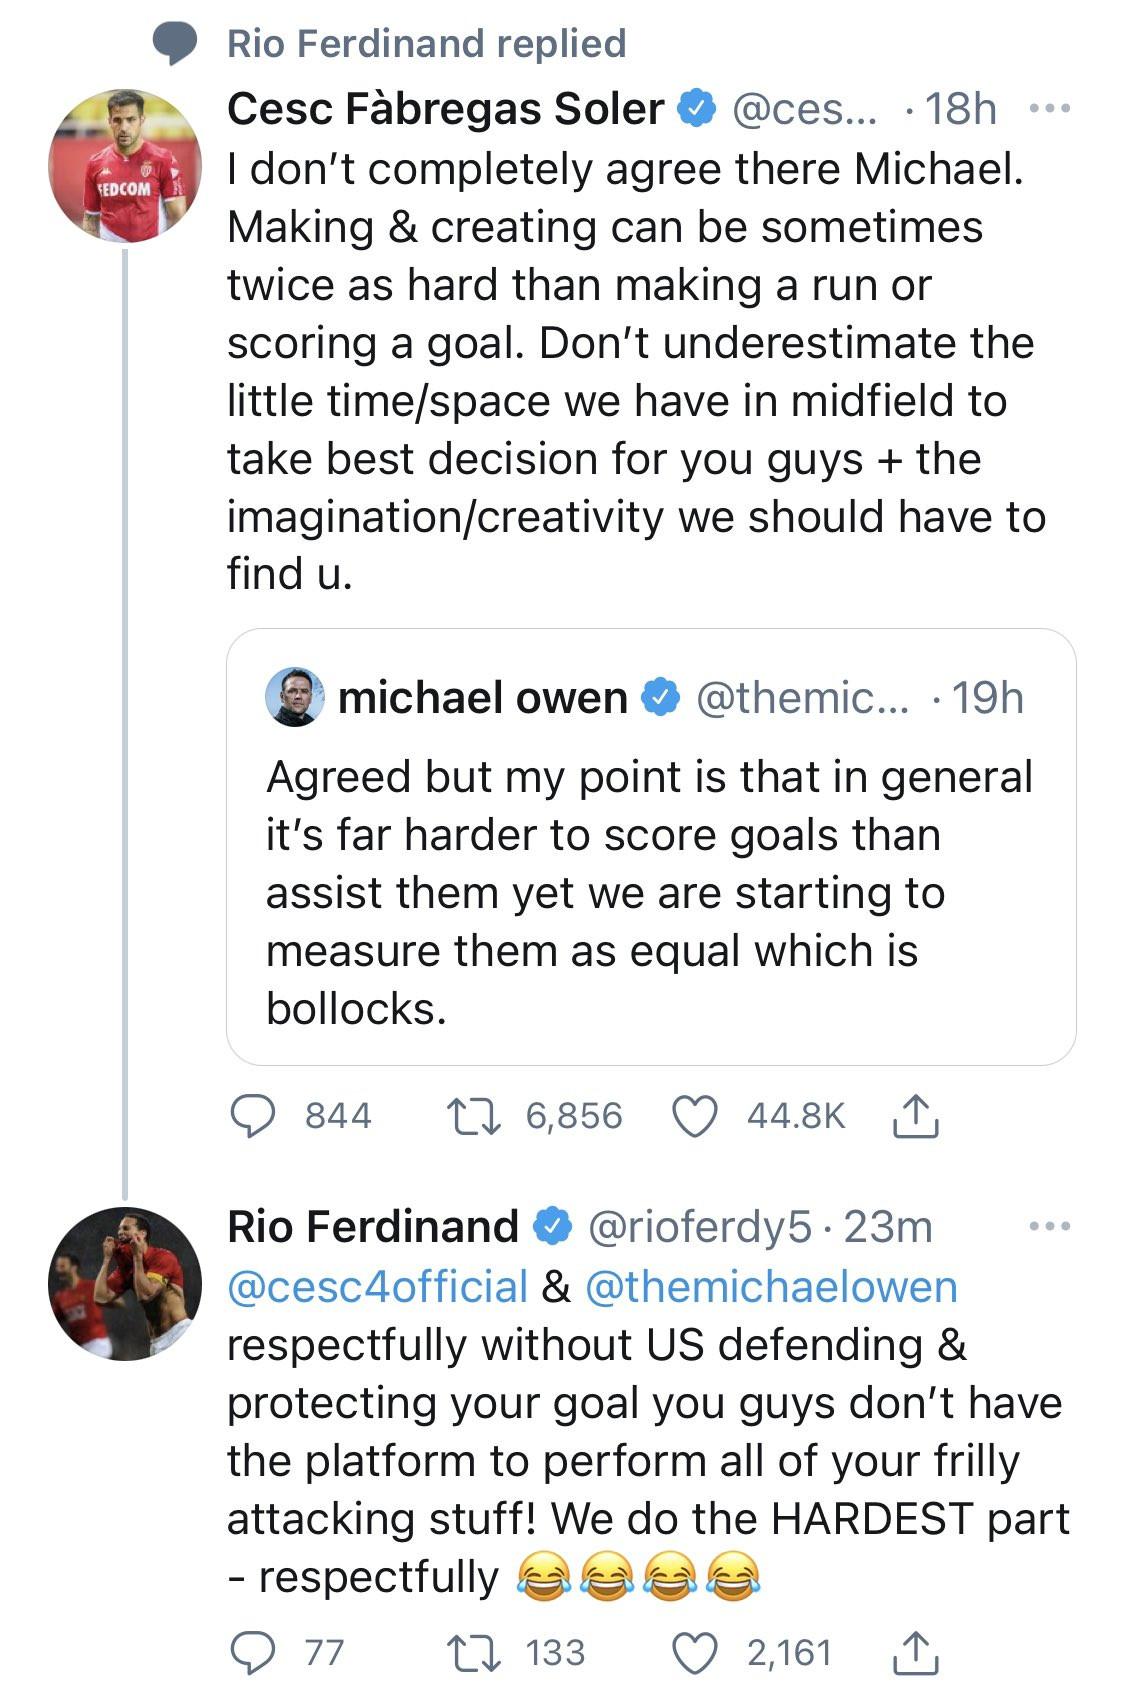 Twitter debate: Cesc Fabregas and Michael Owen, Rio Ferdinand argued that scoring goals is harder than assisting